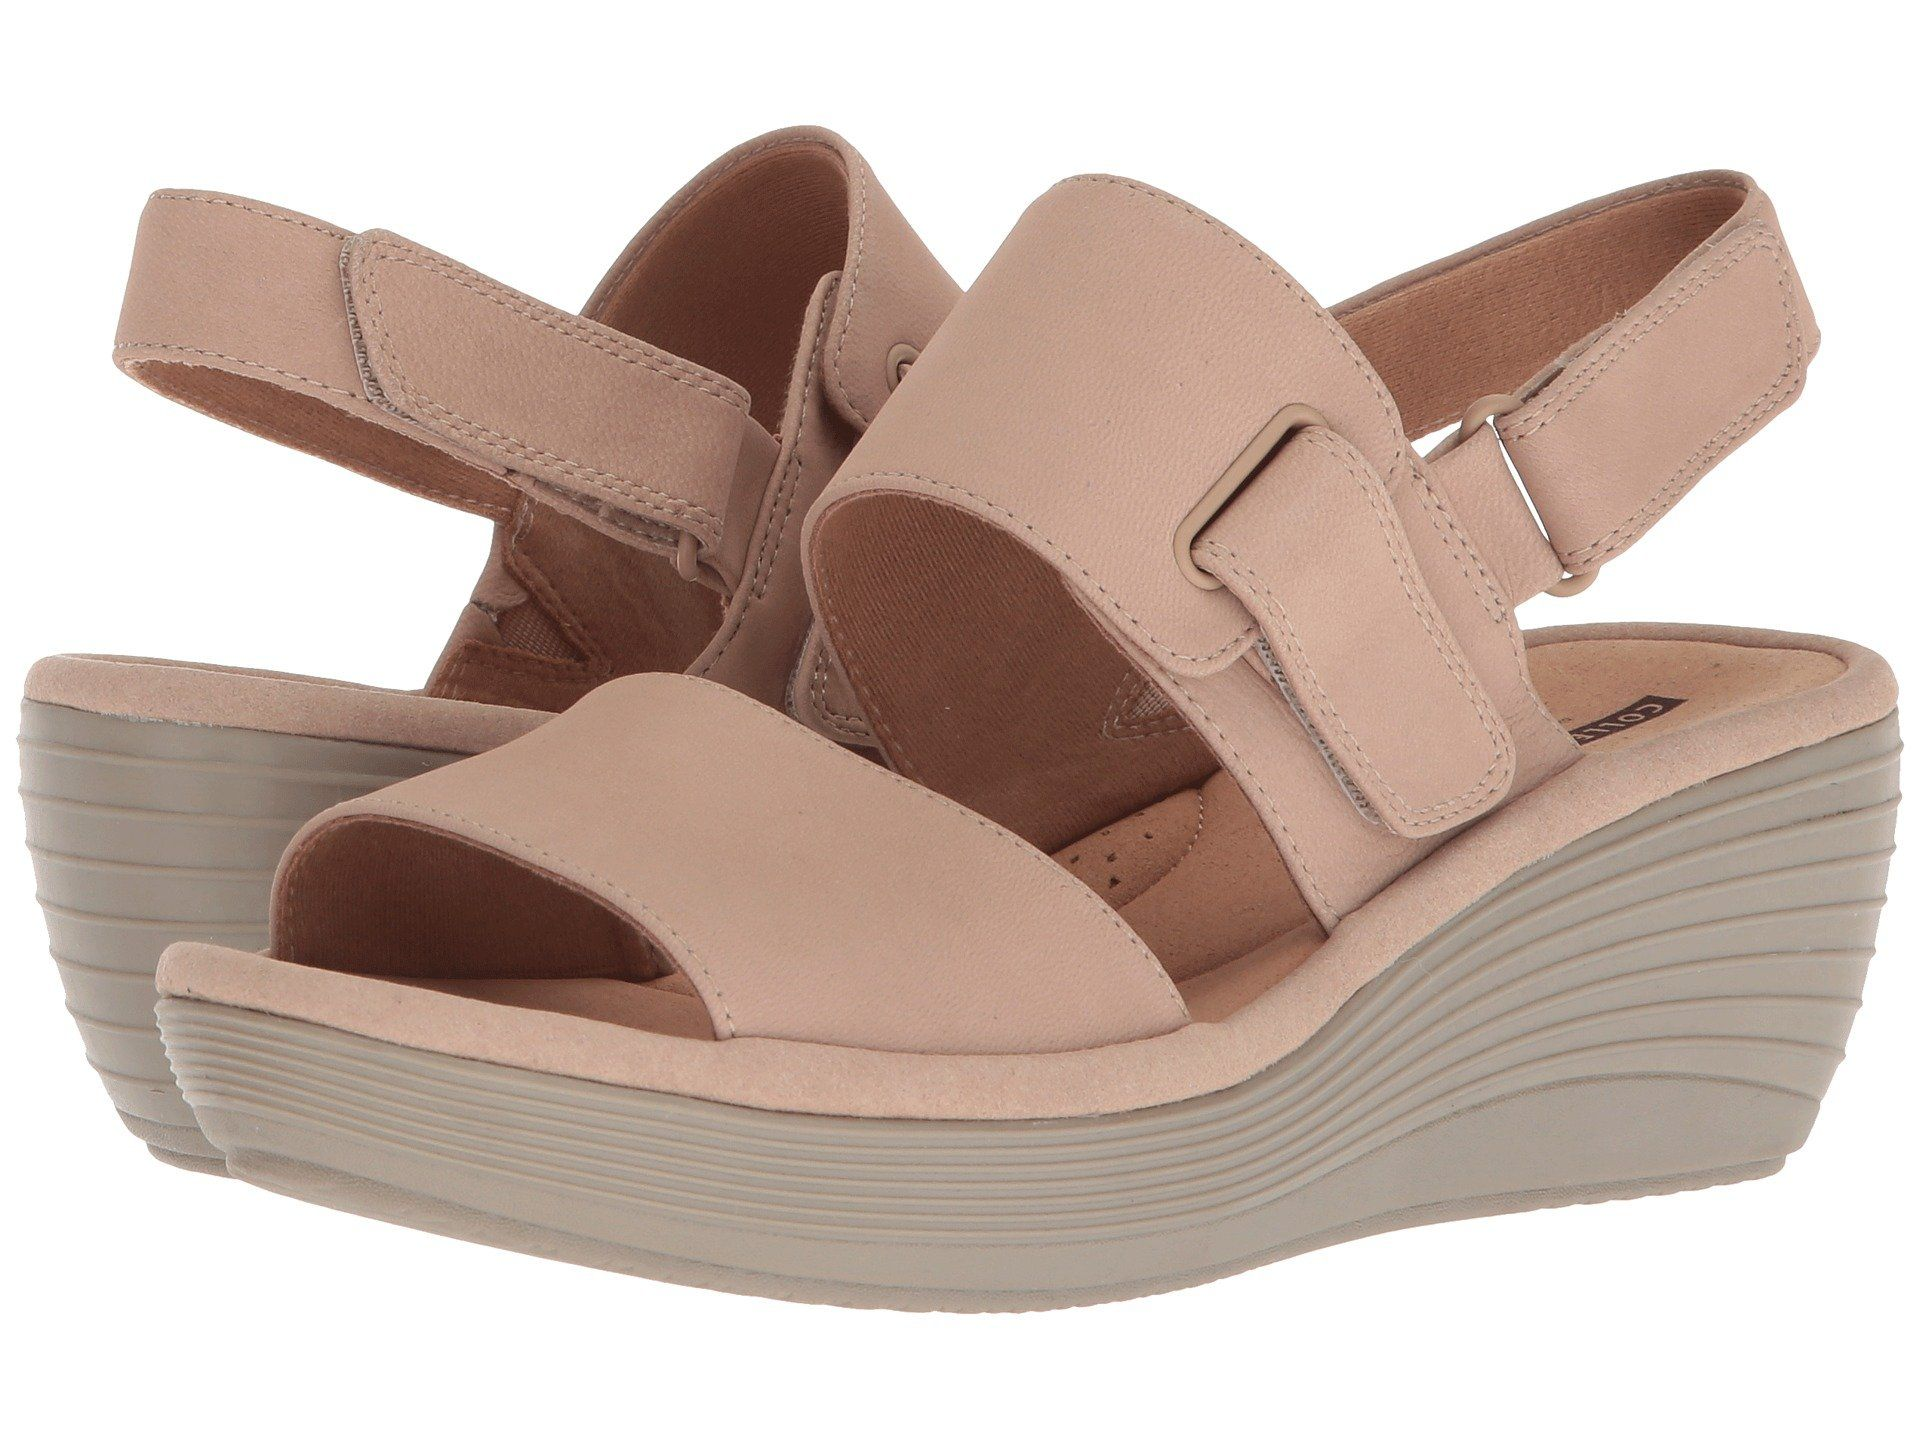 7d0fd463391 Clarks Reedly Breen  Shoproads  onlineshopping  Flat Slip-On   Sandal